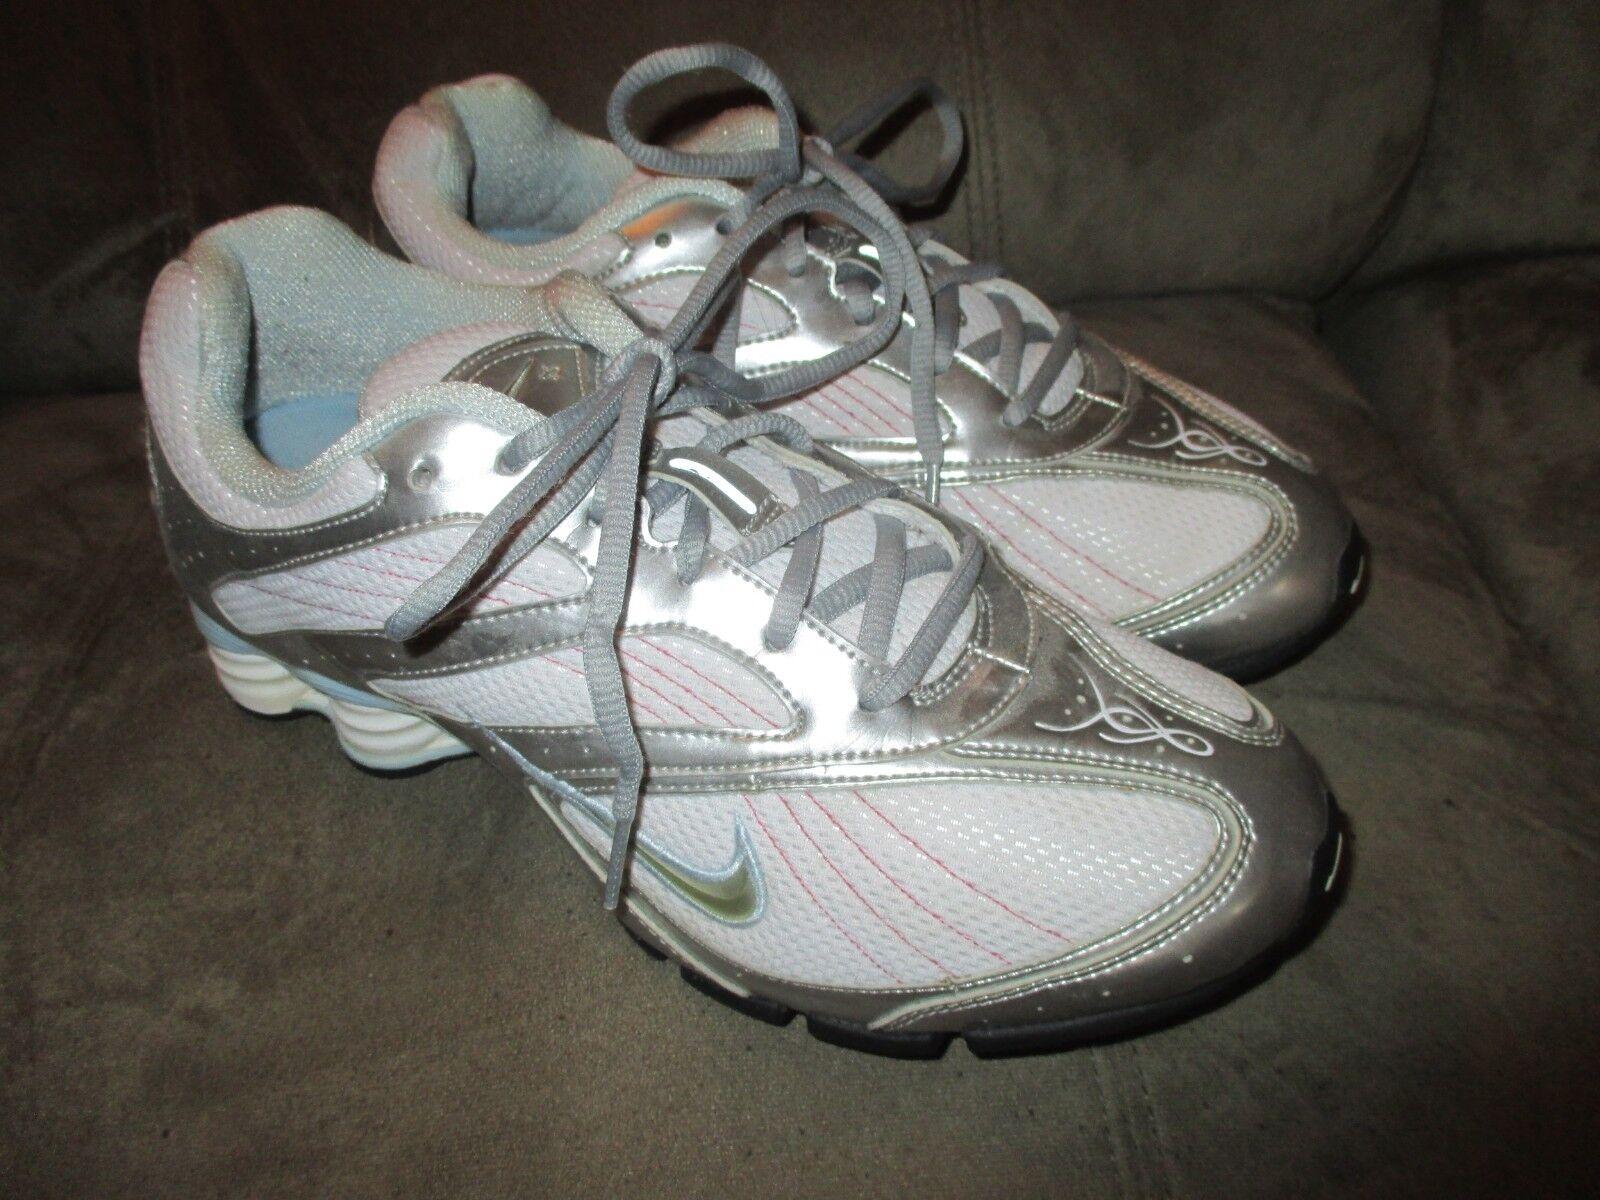 Nike sz 9,5 bianca & argentoo w   rosa le scarpe da corsa di tennis | Alta Qualità  | Uomo/Donna Scarpa